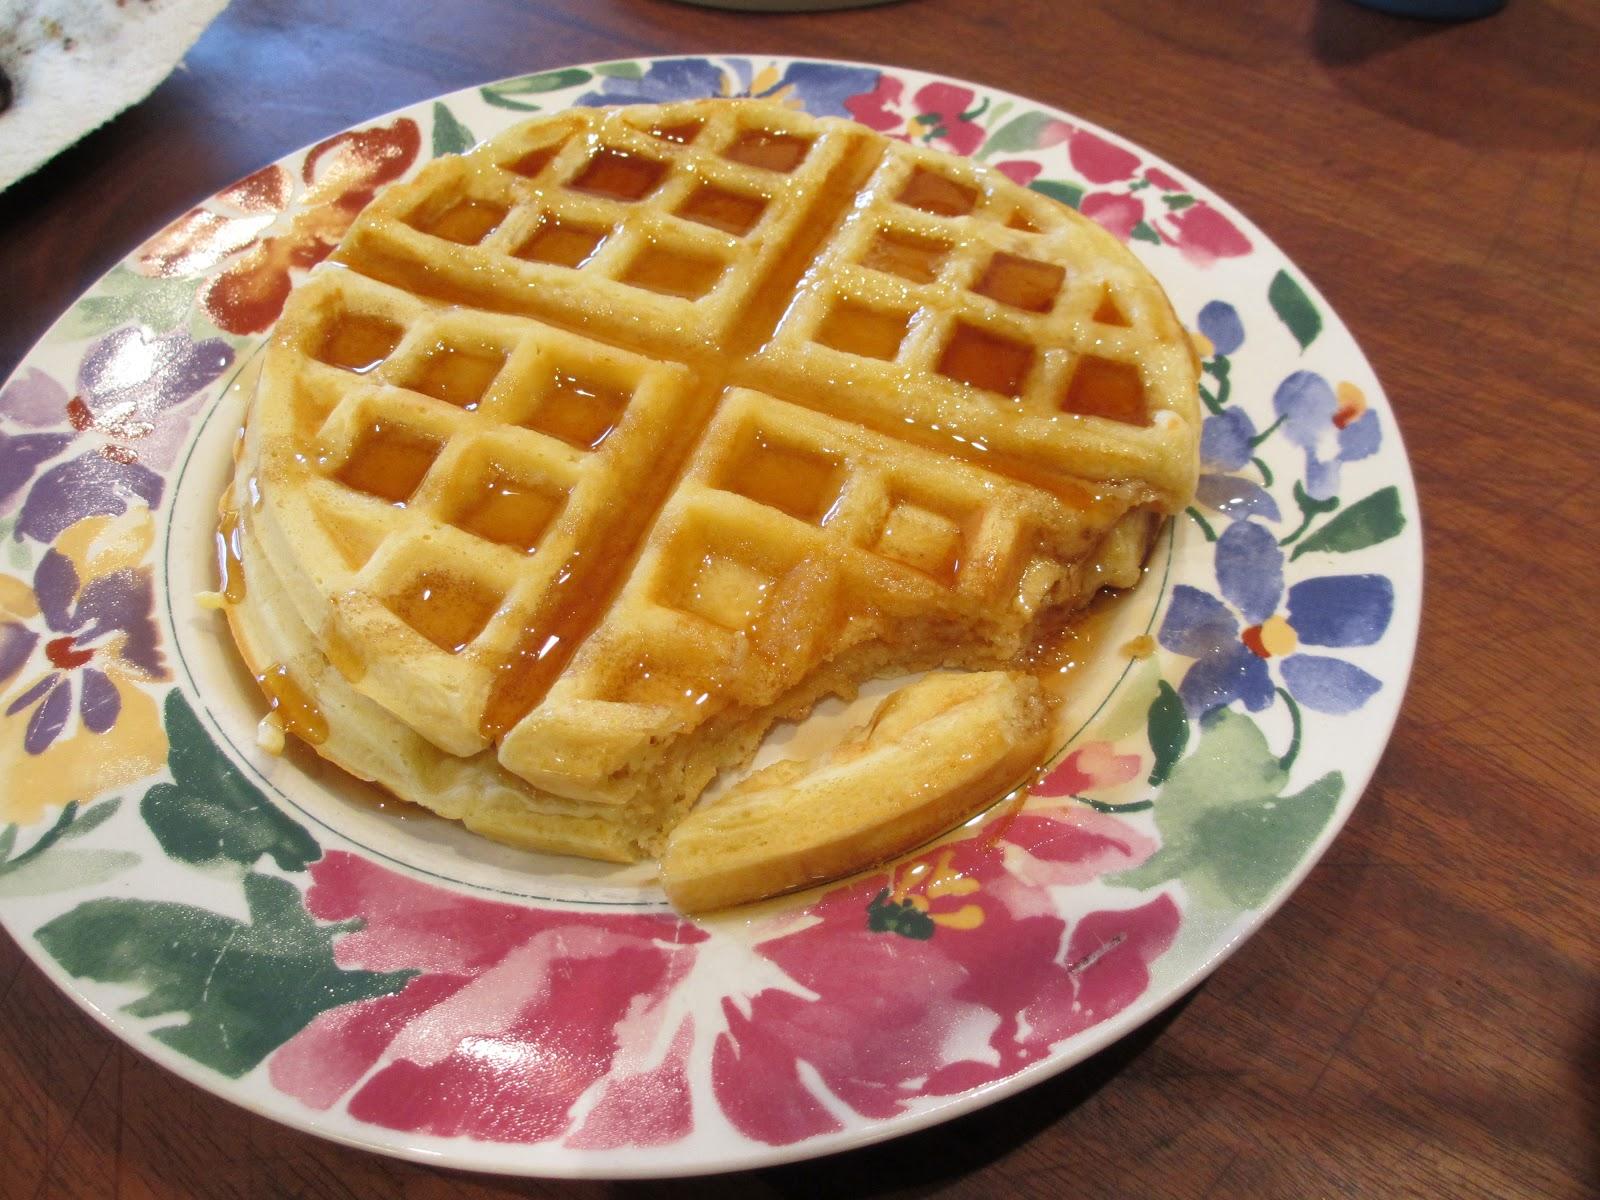 Life as Lori: Easy to make Waffles!